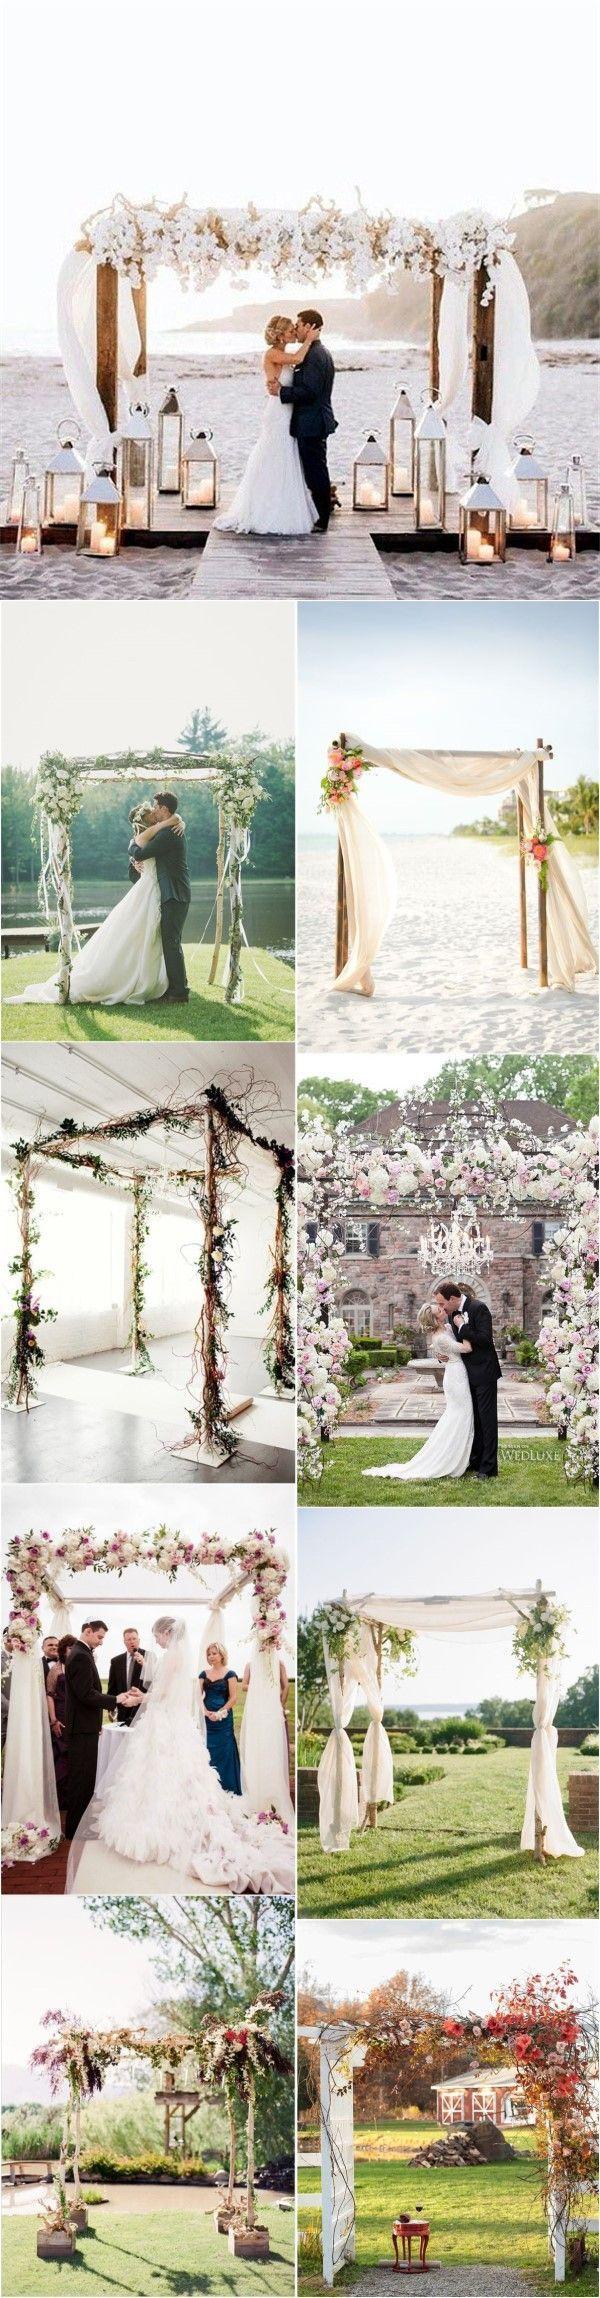 Wedding Decorations Imaginative Unique Floral Wedding Chuppah